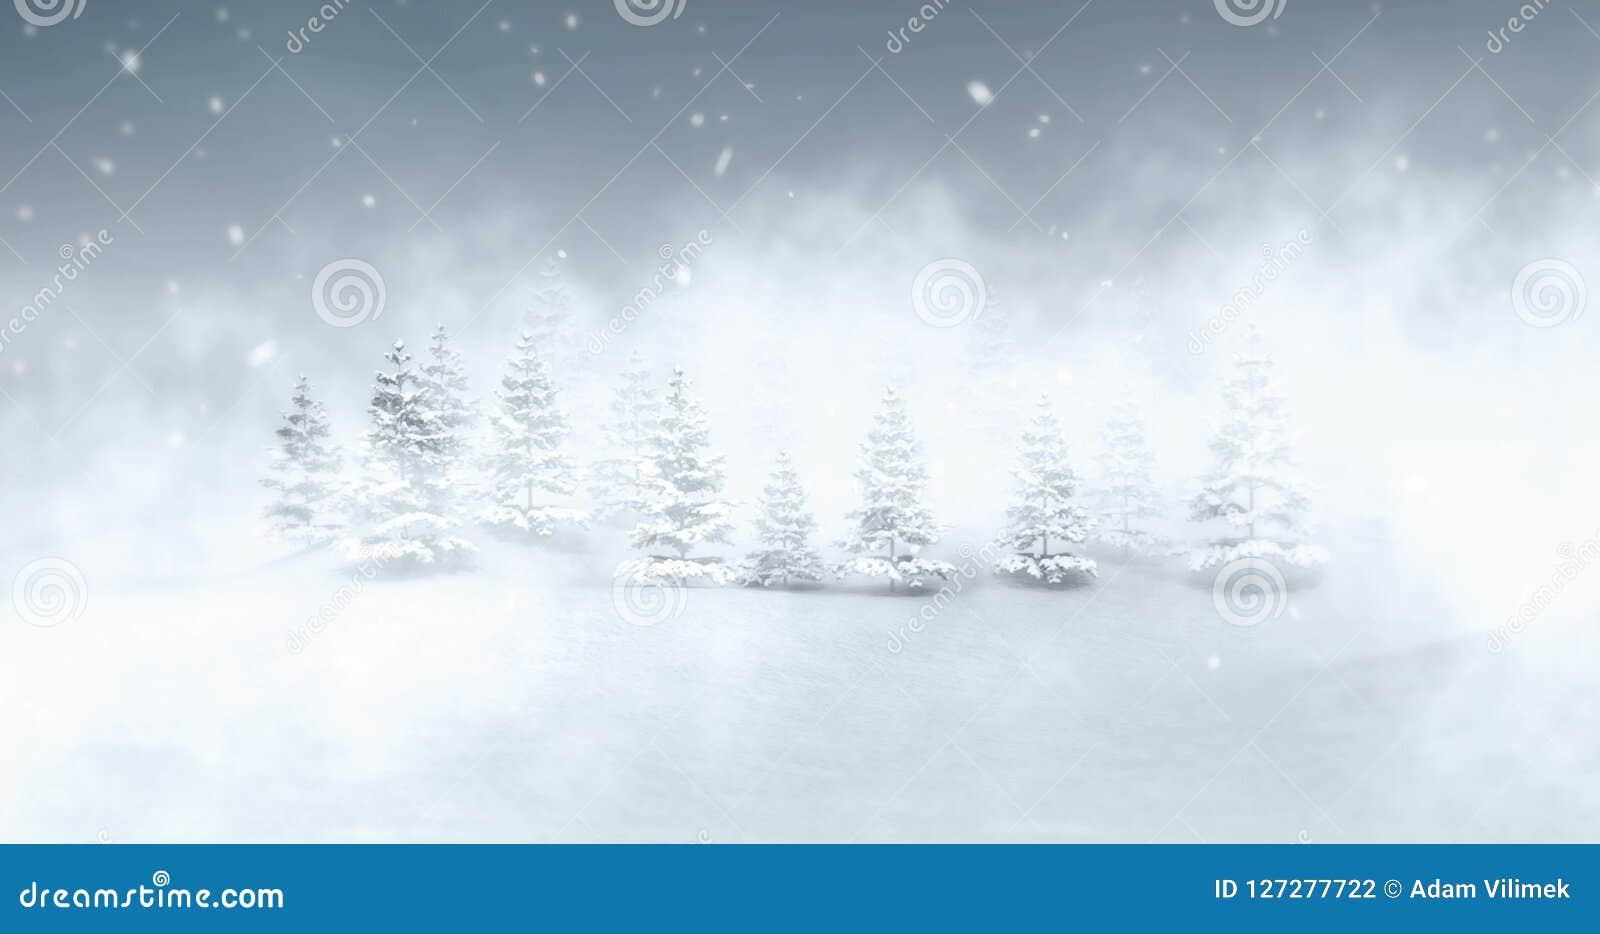 Winter Seasonal Landscape At Evening Snowfall And Fog Stock Footage